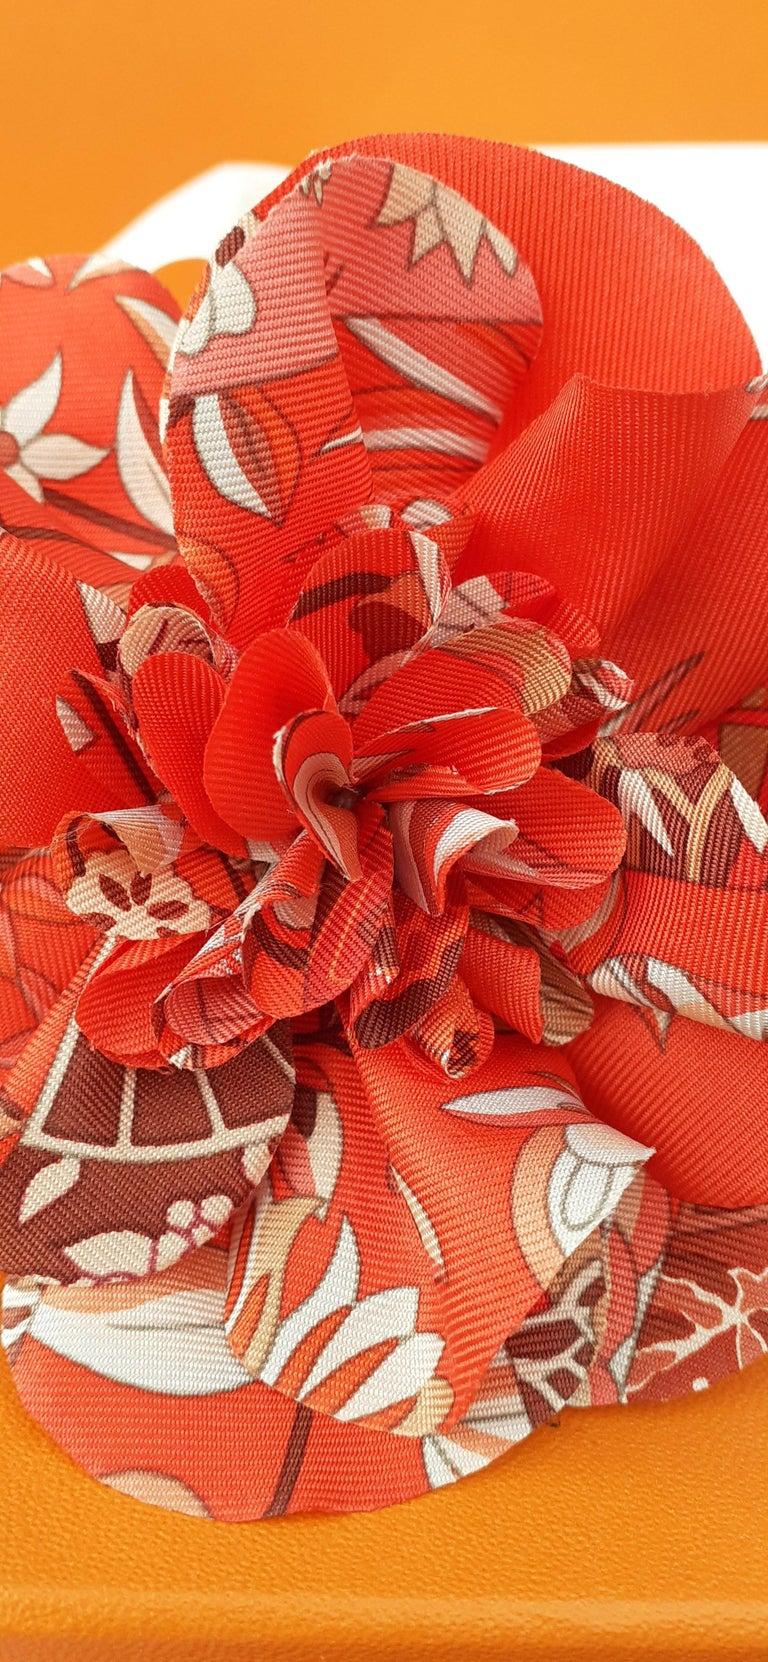 Exceptional Hermès Rare Silk Scarf Brooch Charm La Fleur Red 3